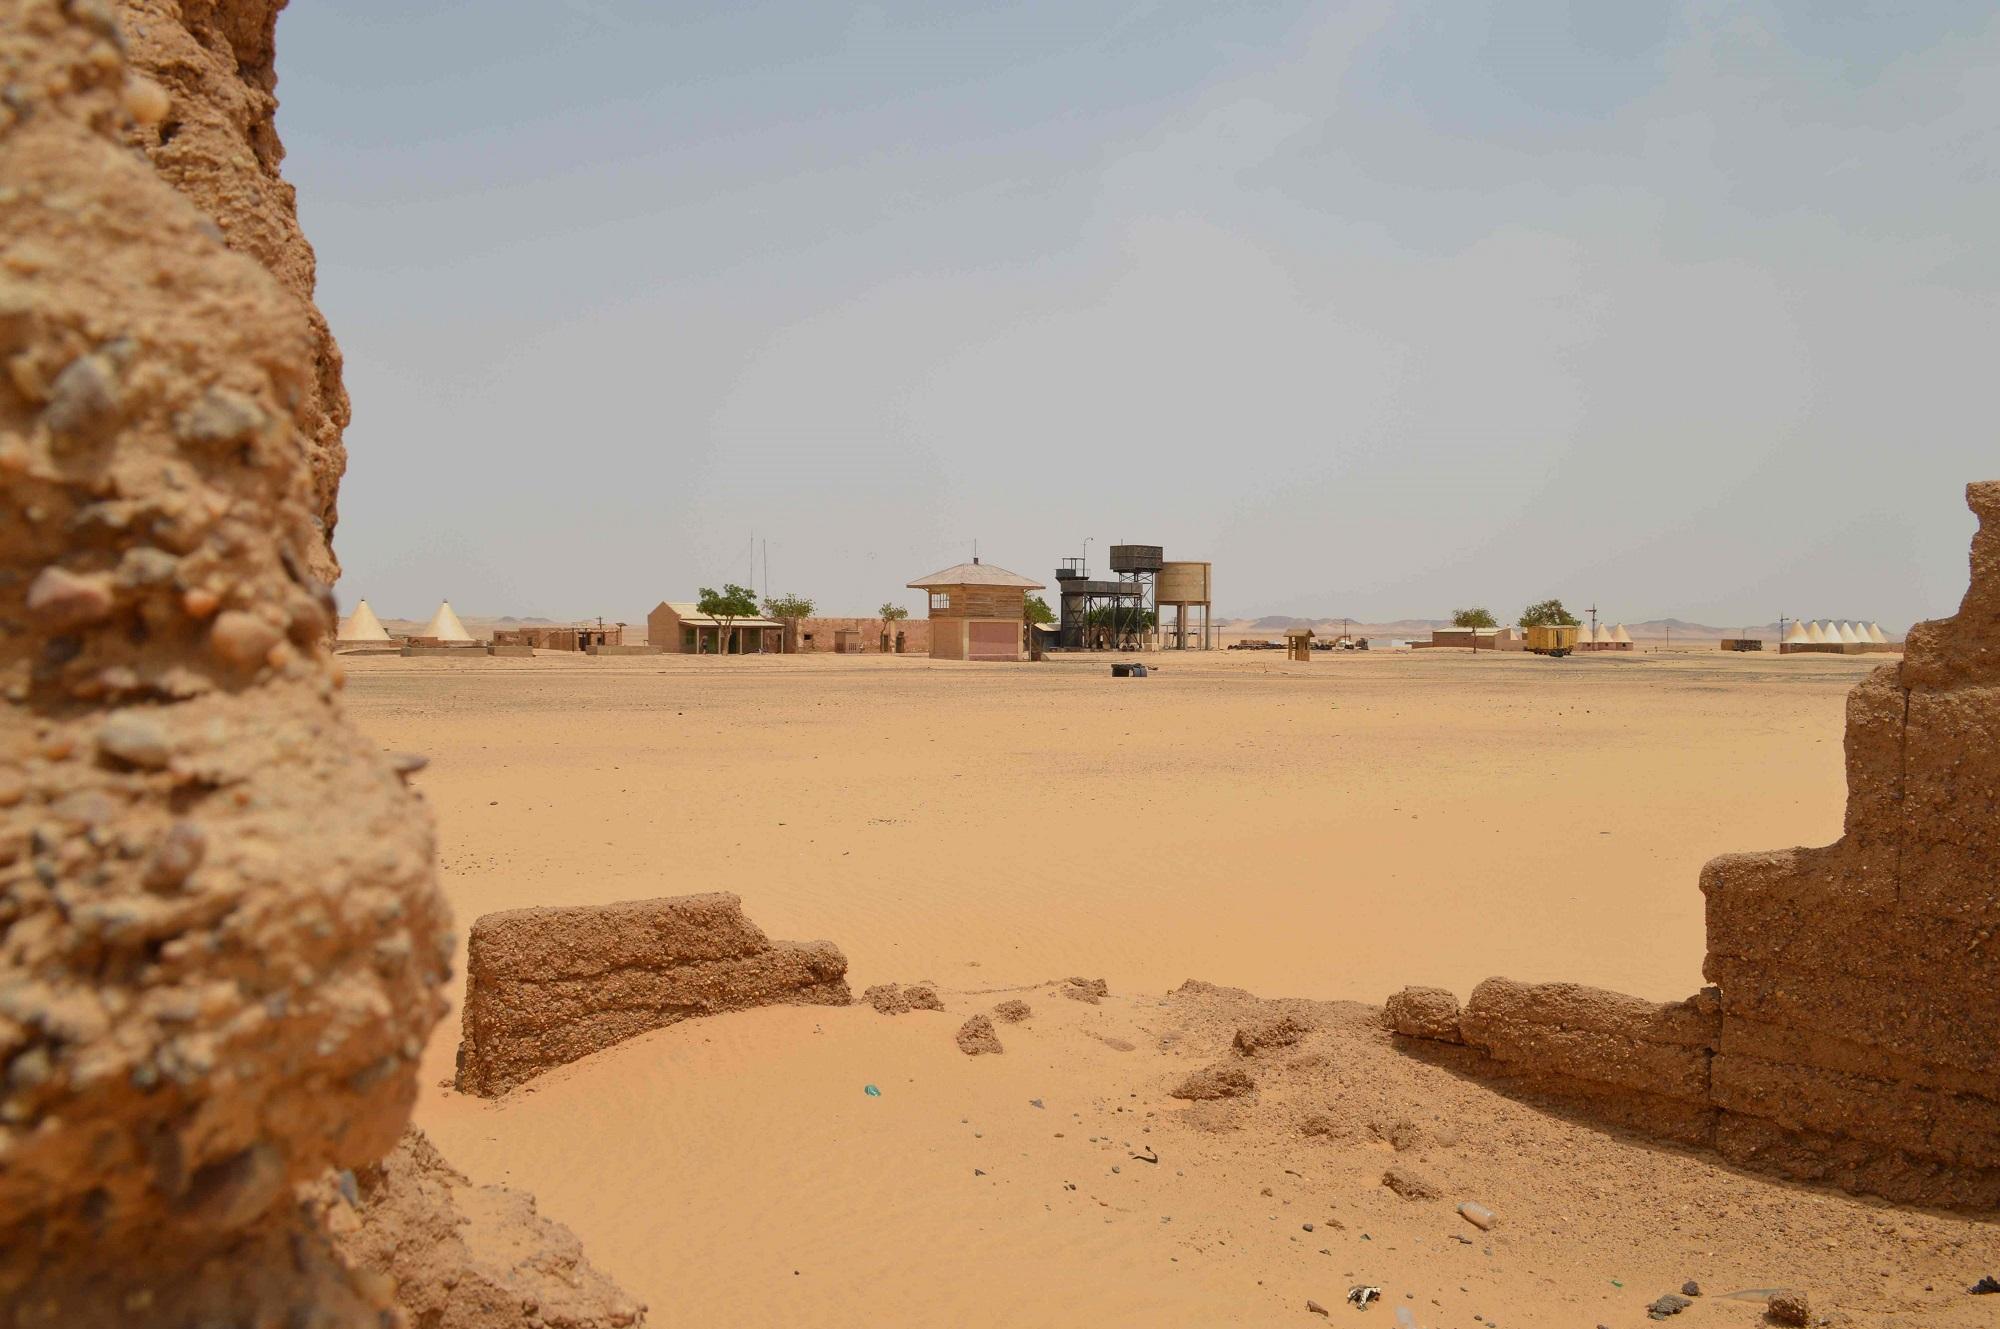 2014-CMCPHERSON-SUDAN-15